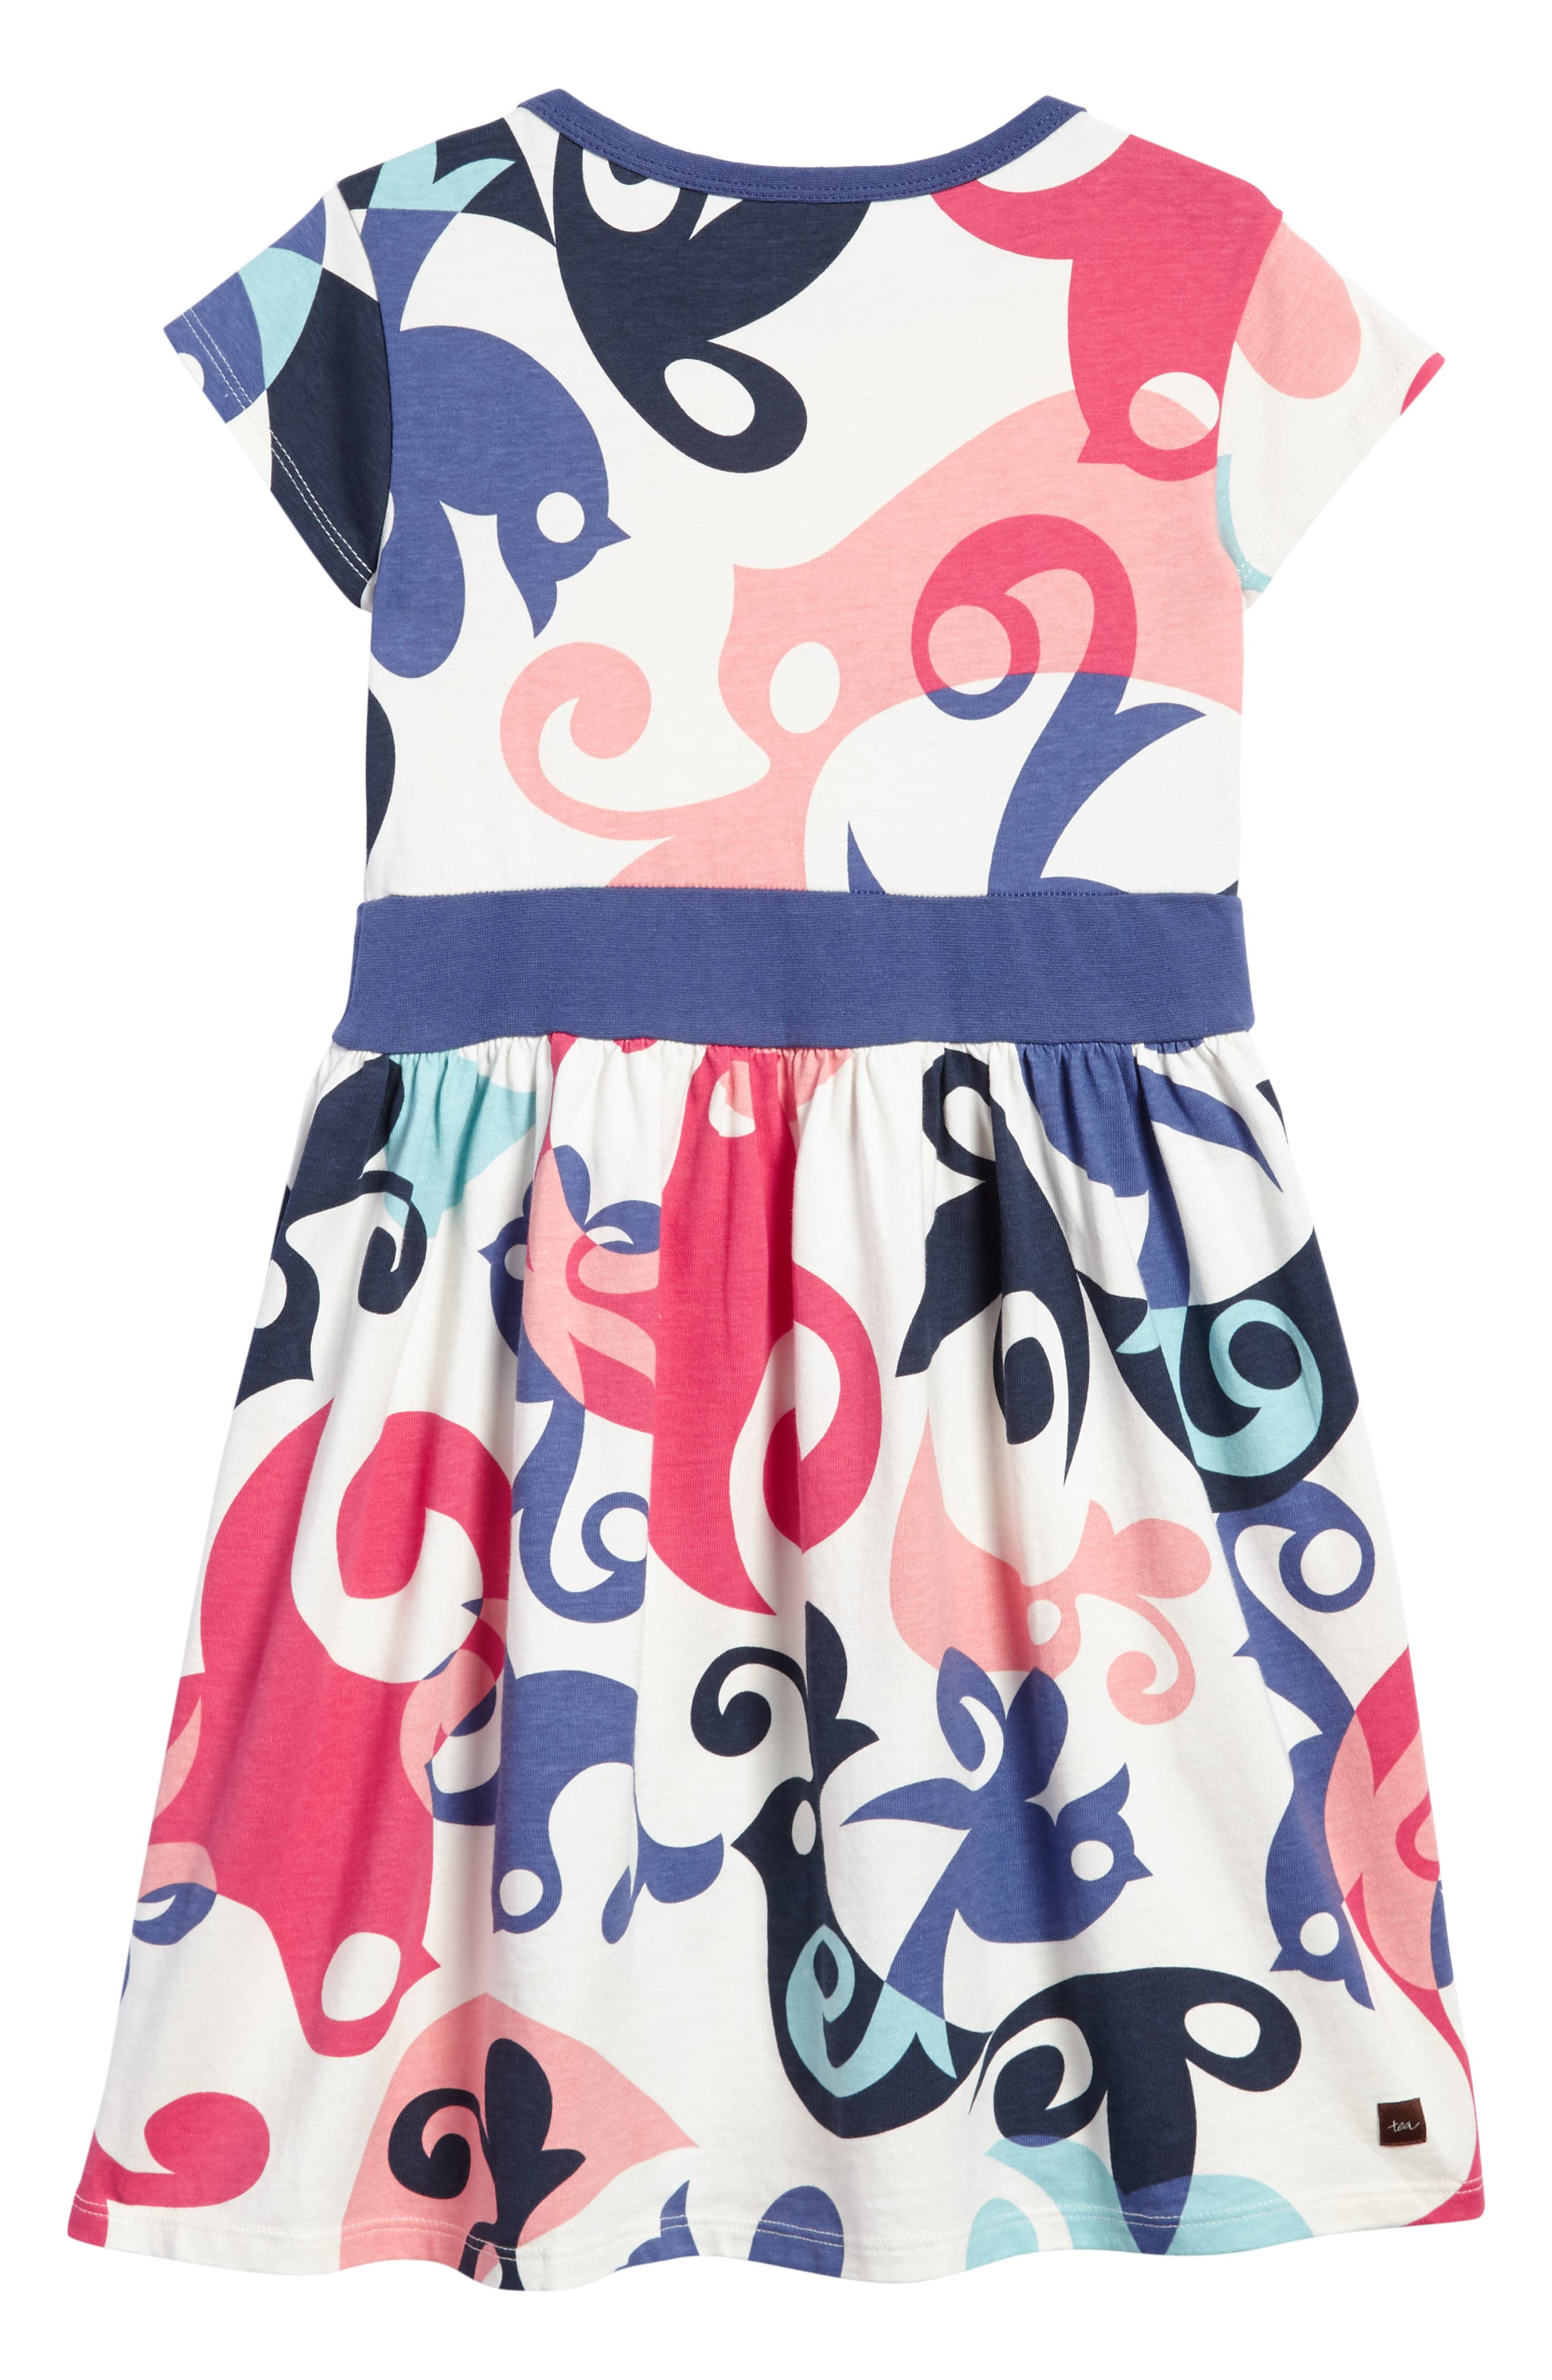 Tweet Dress,                             Alternate thumbnail 2, color,                             900